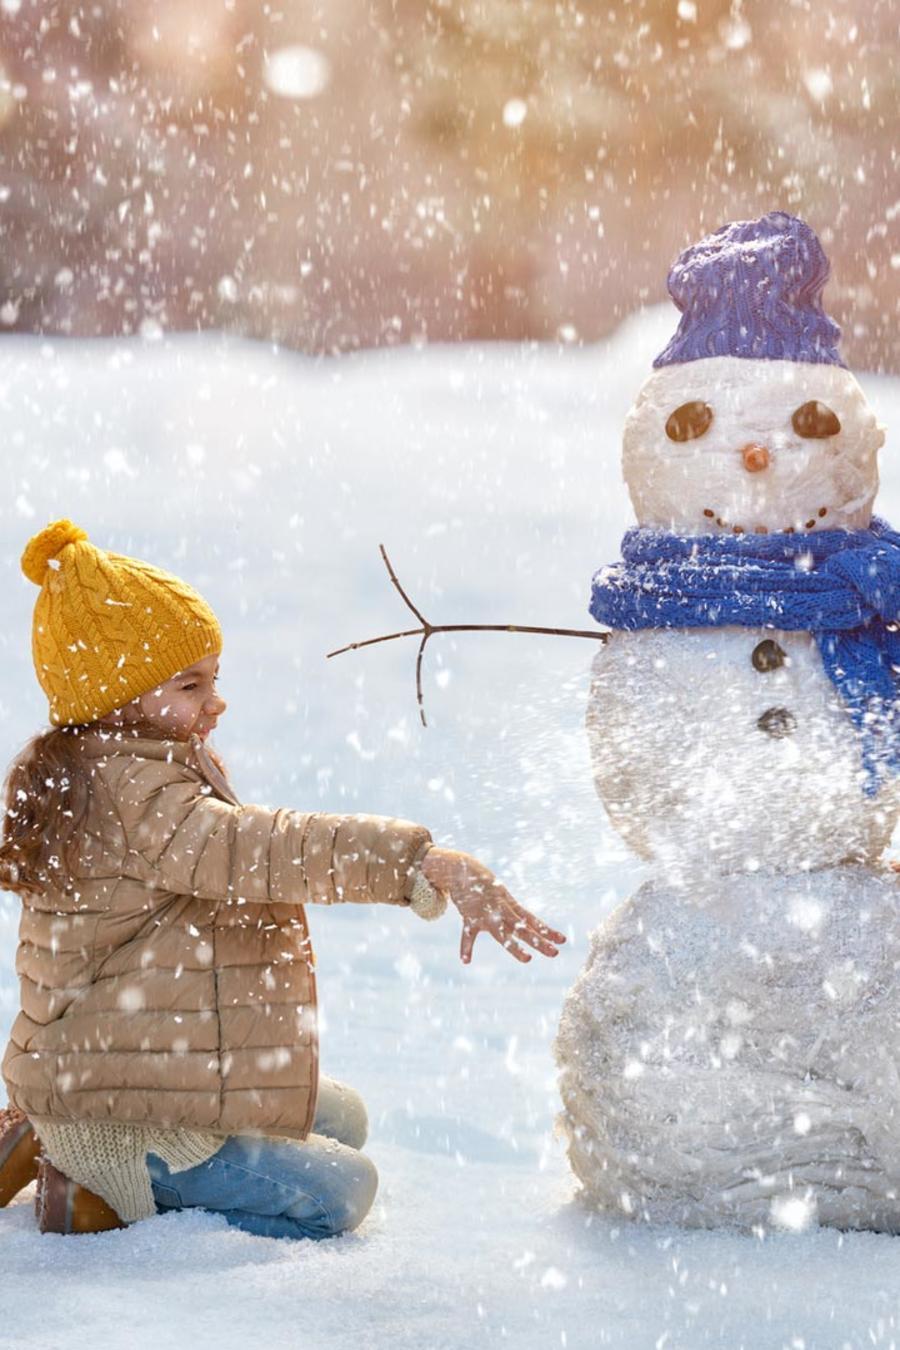 Madre e hija jugando en la nieve